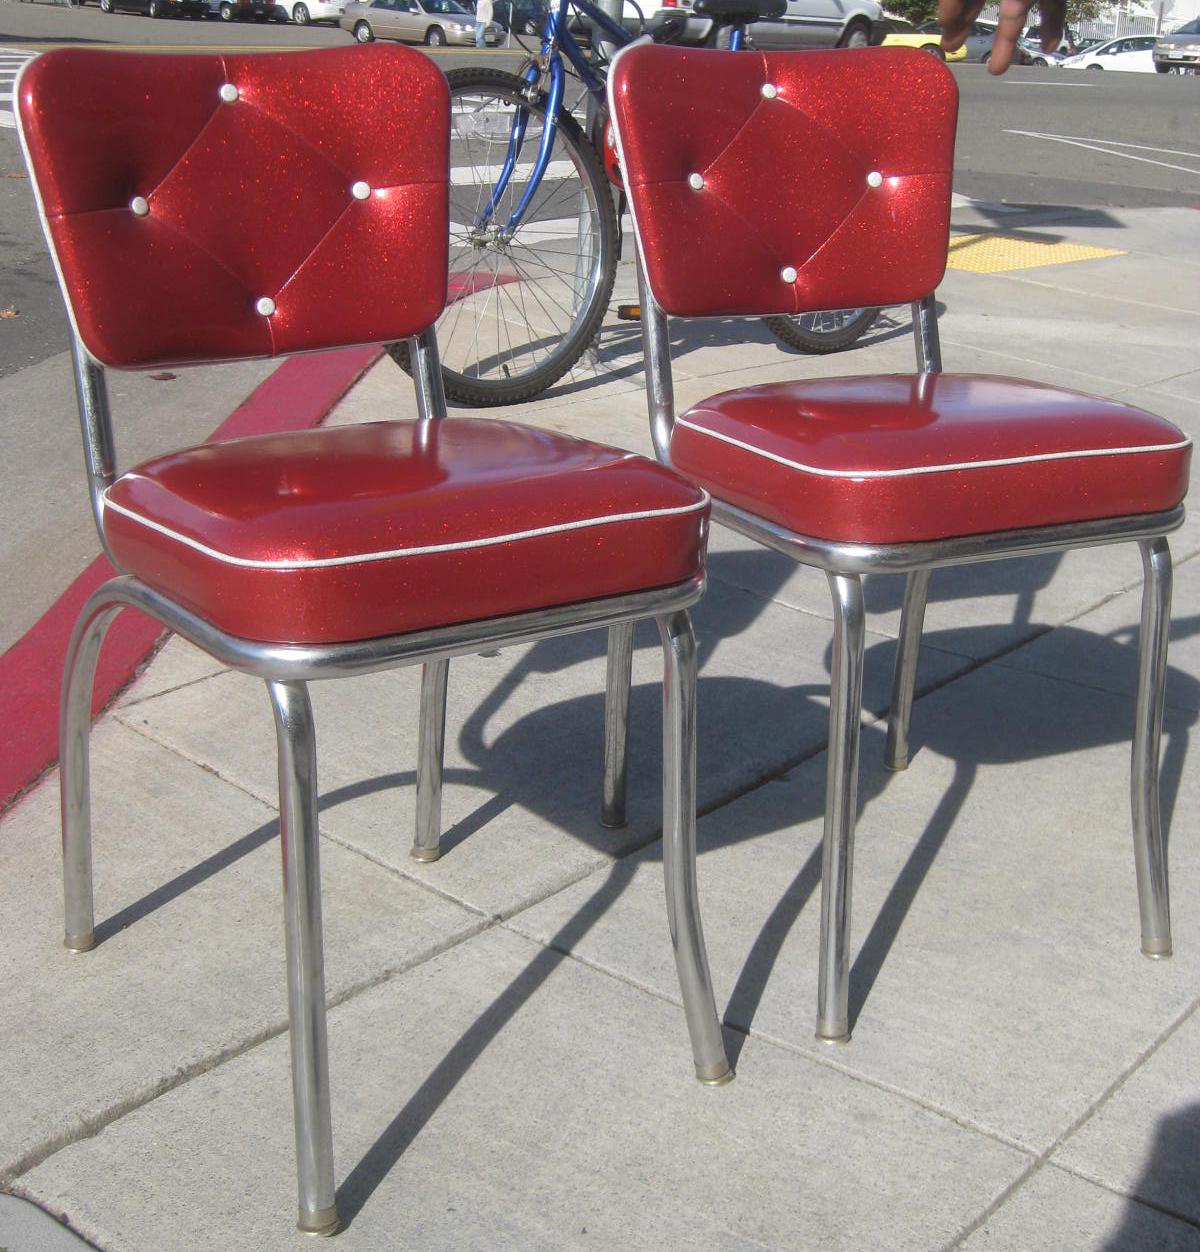 uhuru furniture amp collectibles sold two retro red kitchen chairs rh kitchenchairsideas blogspot com